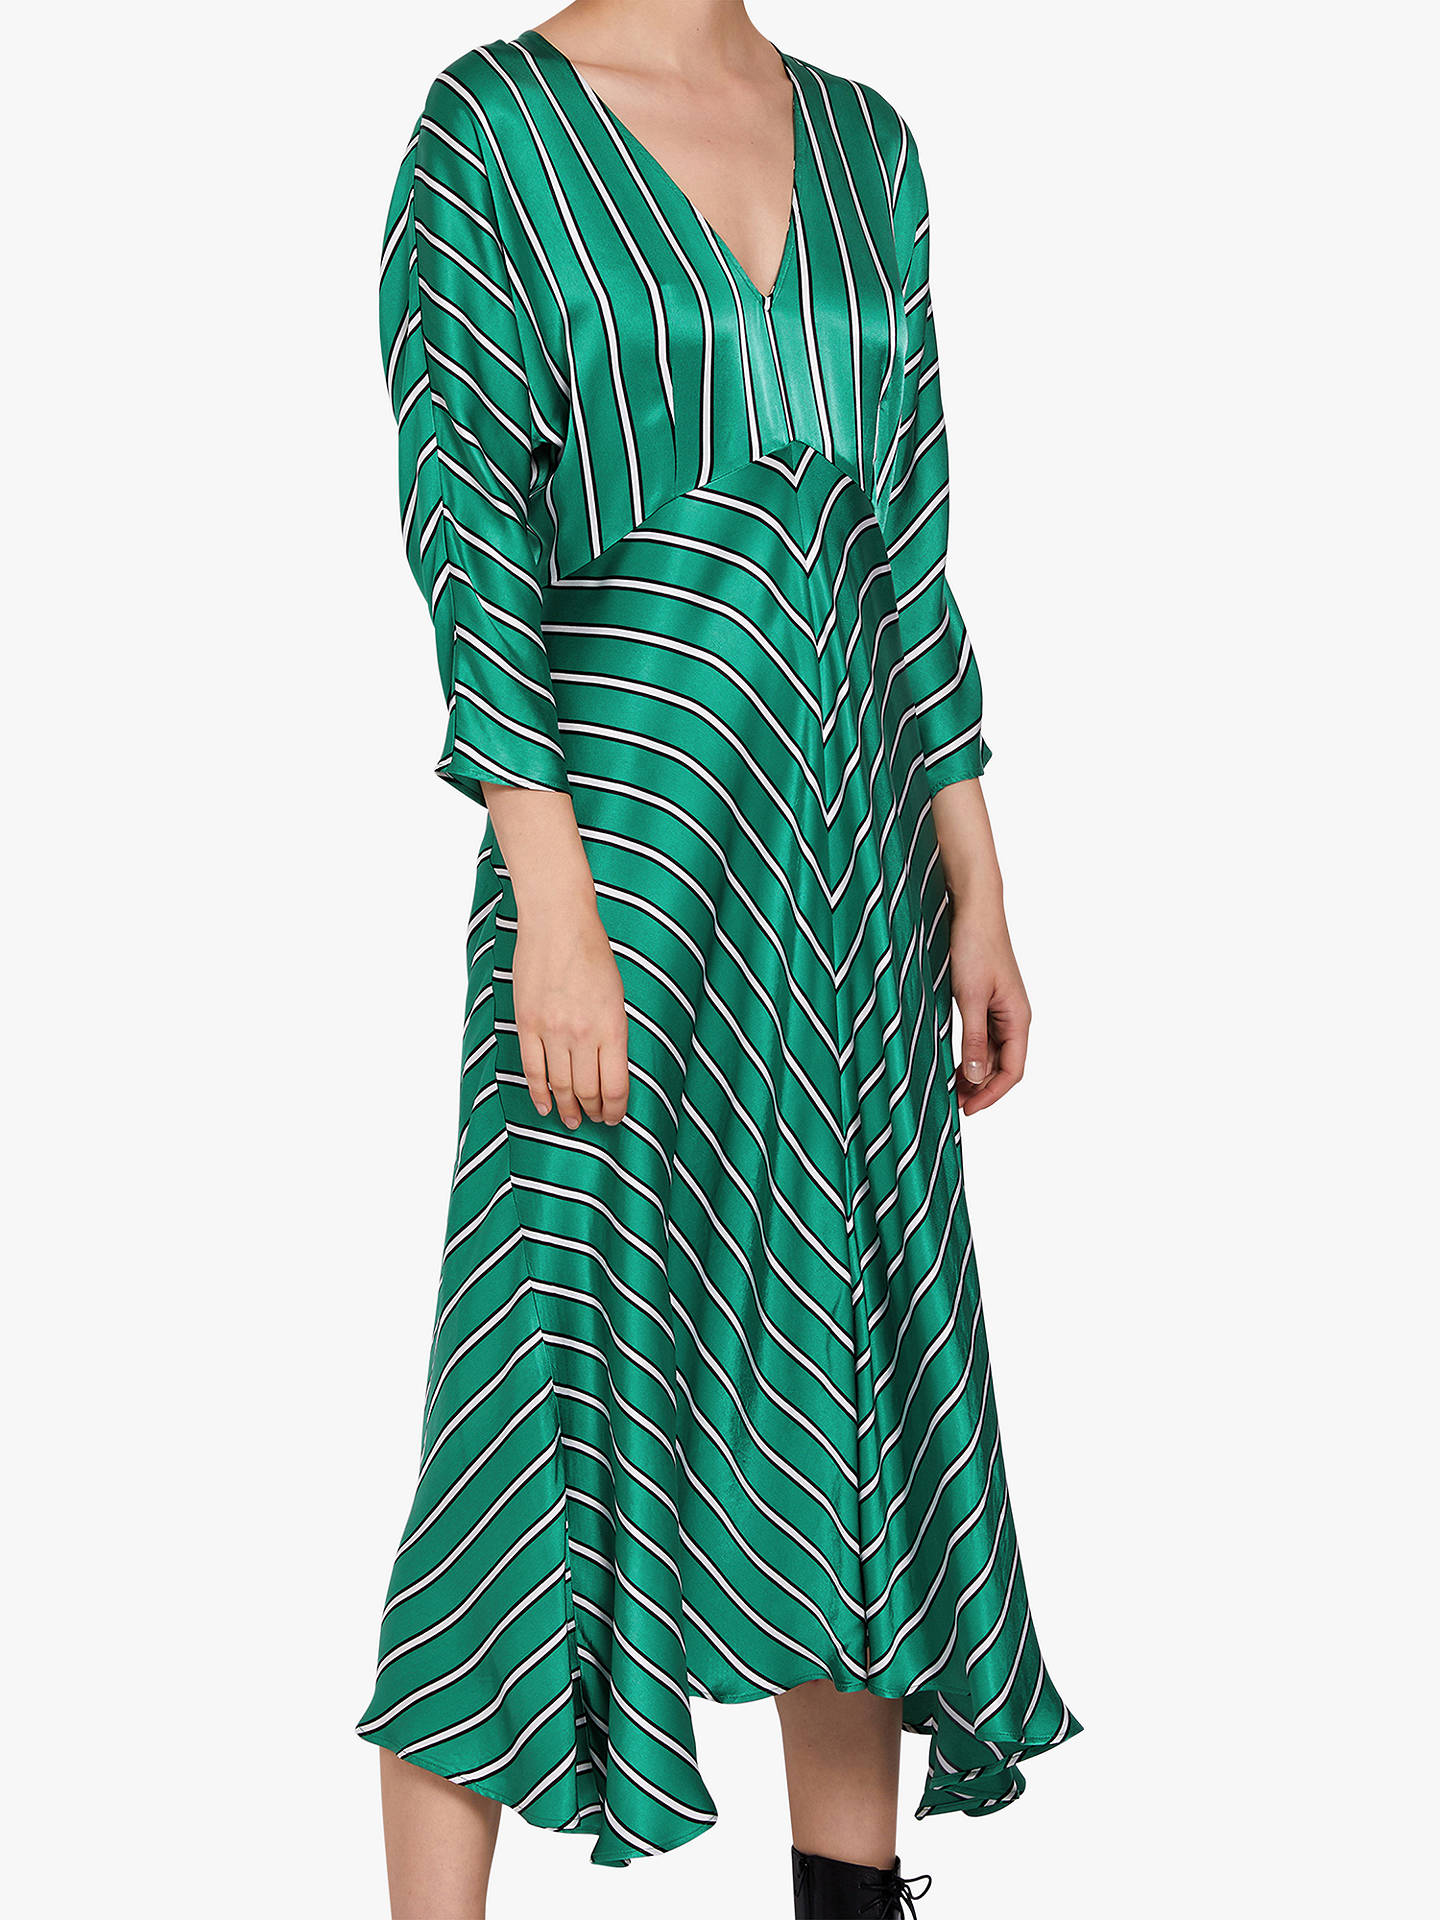 667935ab797a8 Ghost Georgia Pinstripe Satin Dress, Green